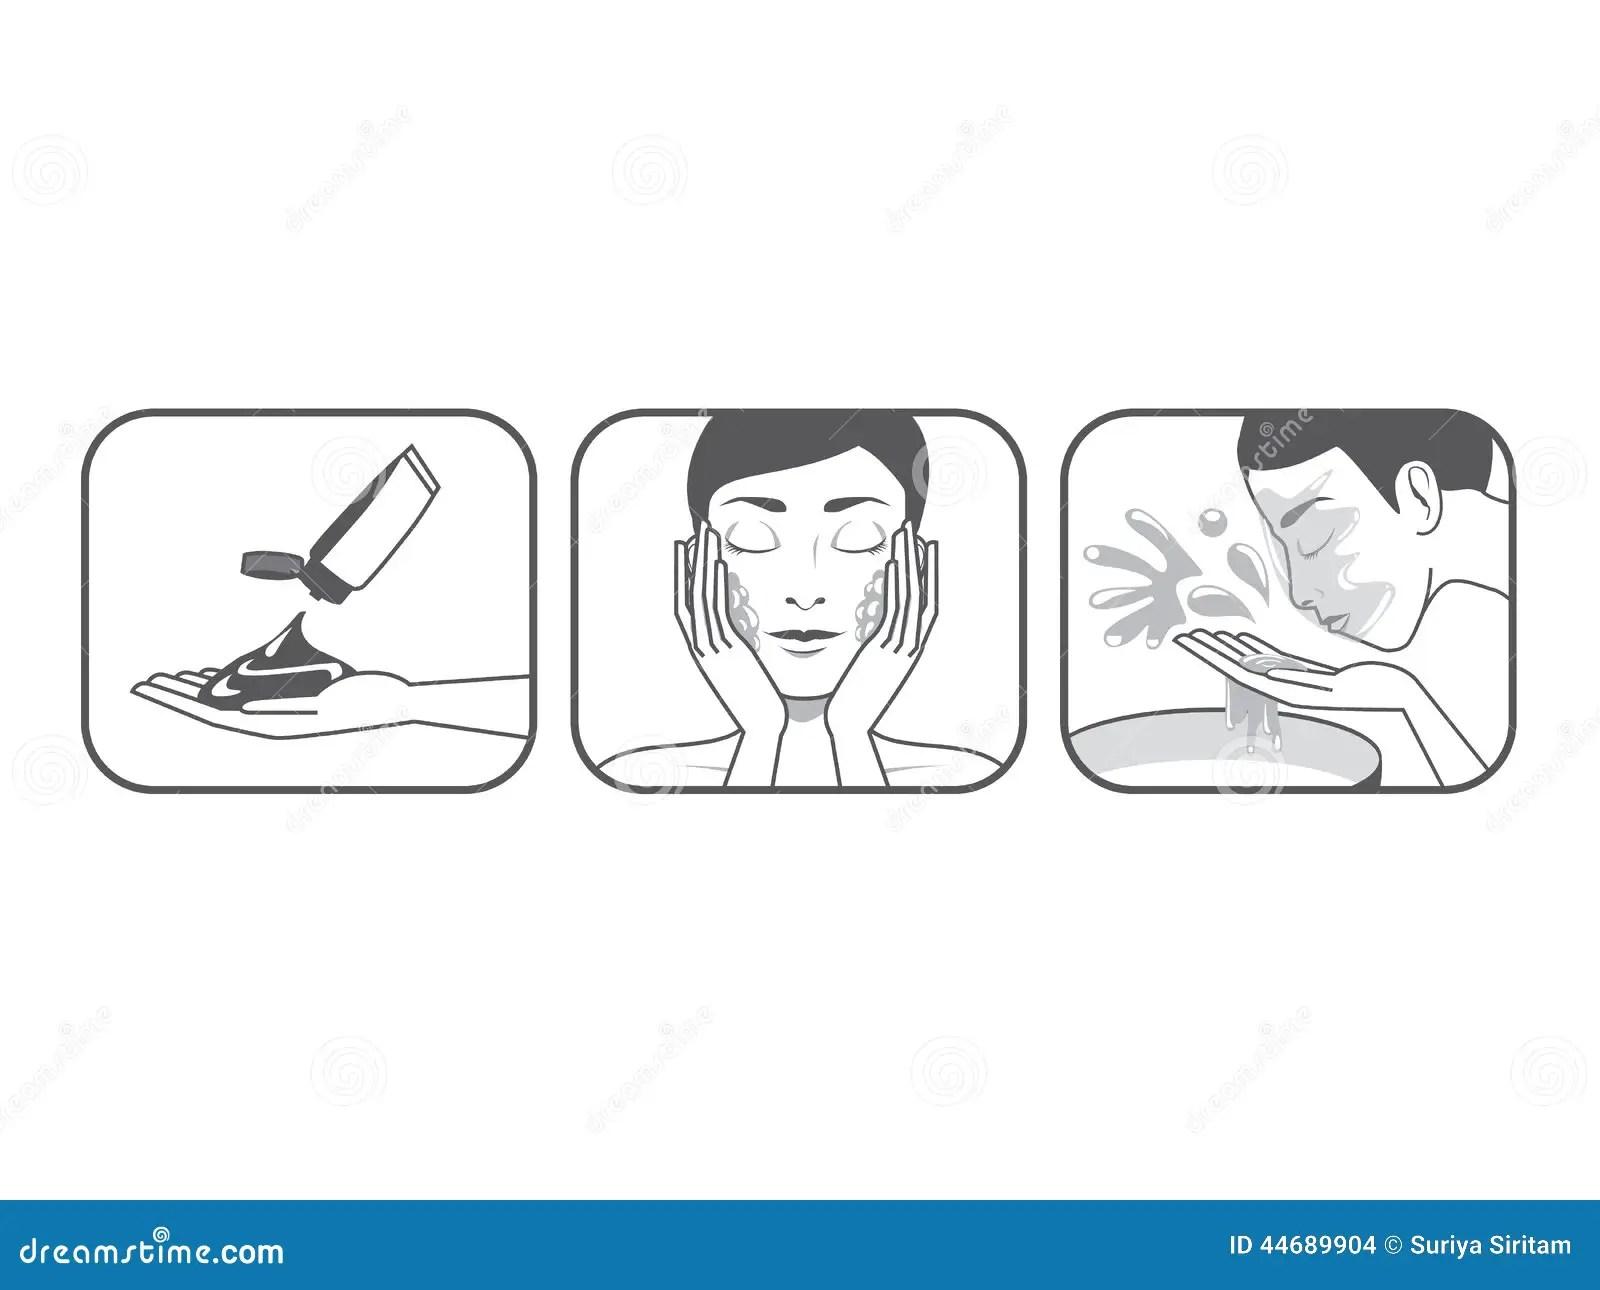 Women-Wash-Face-Cartoon stock vector. Illustration of face